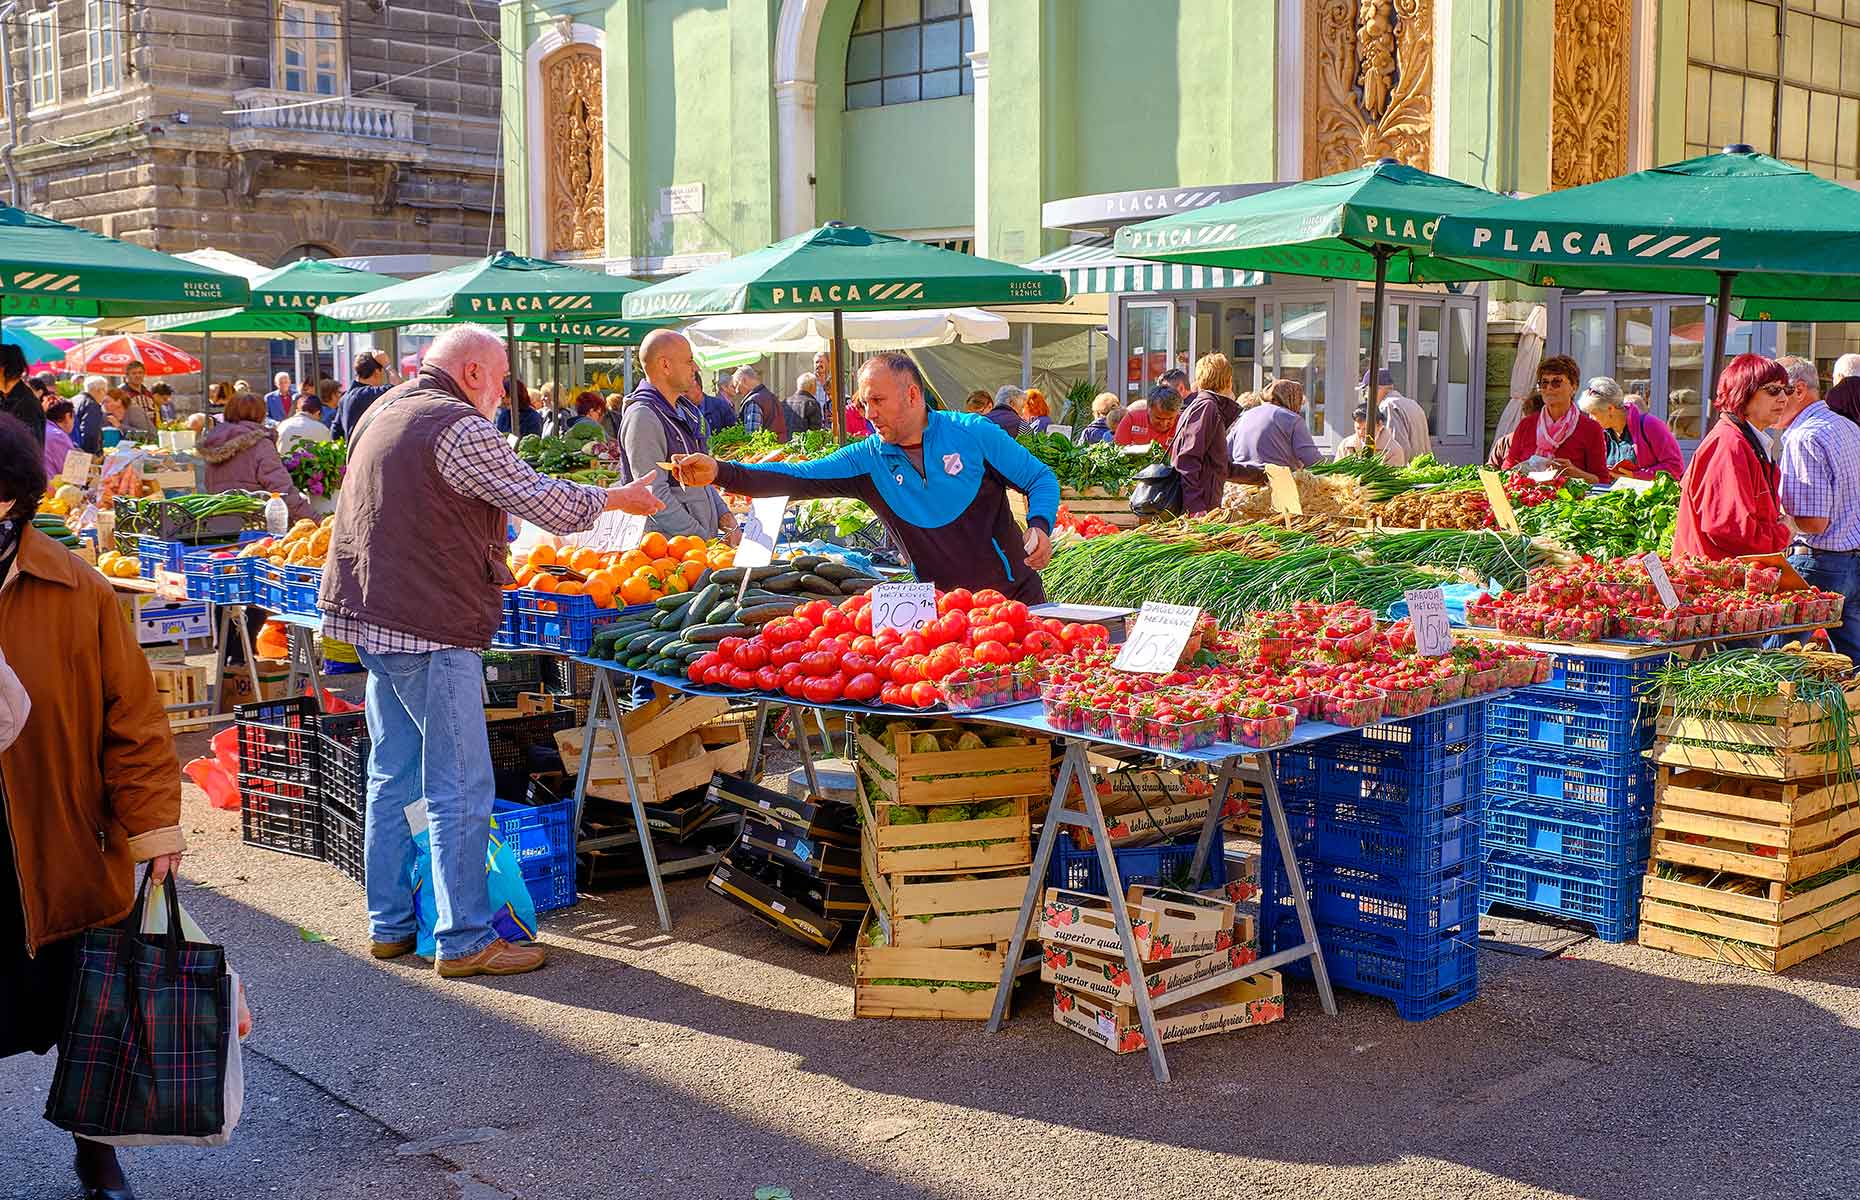 Market in Rijeka, Croatia (Image: meandering images/Shutterstock)